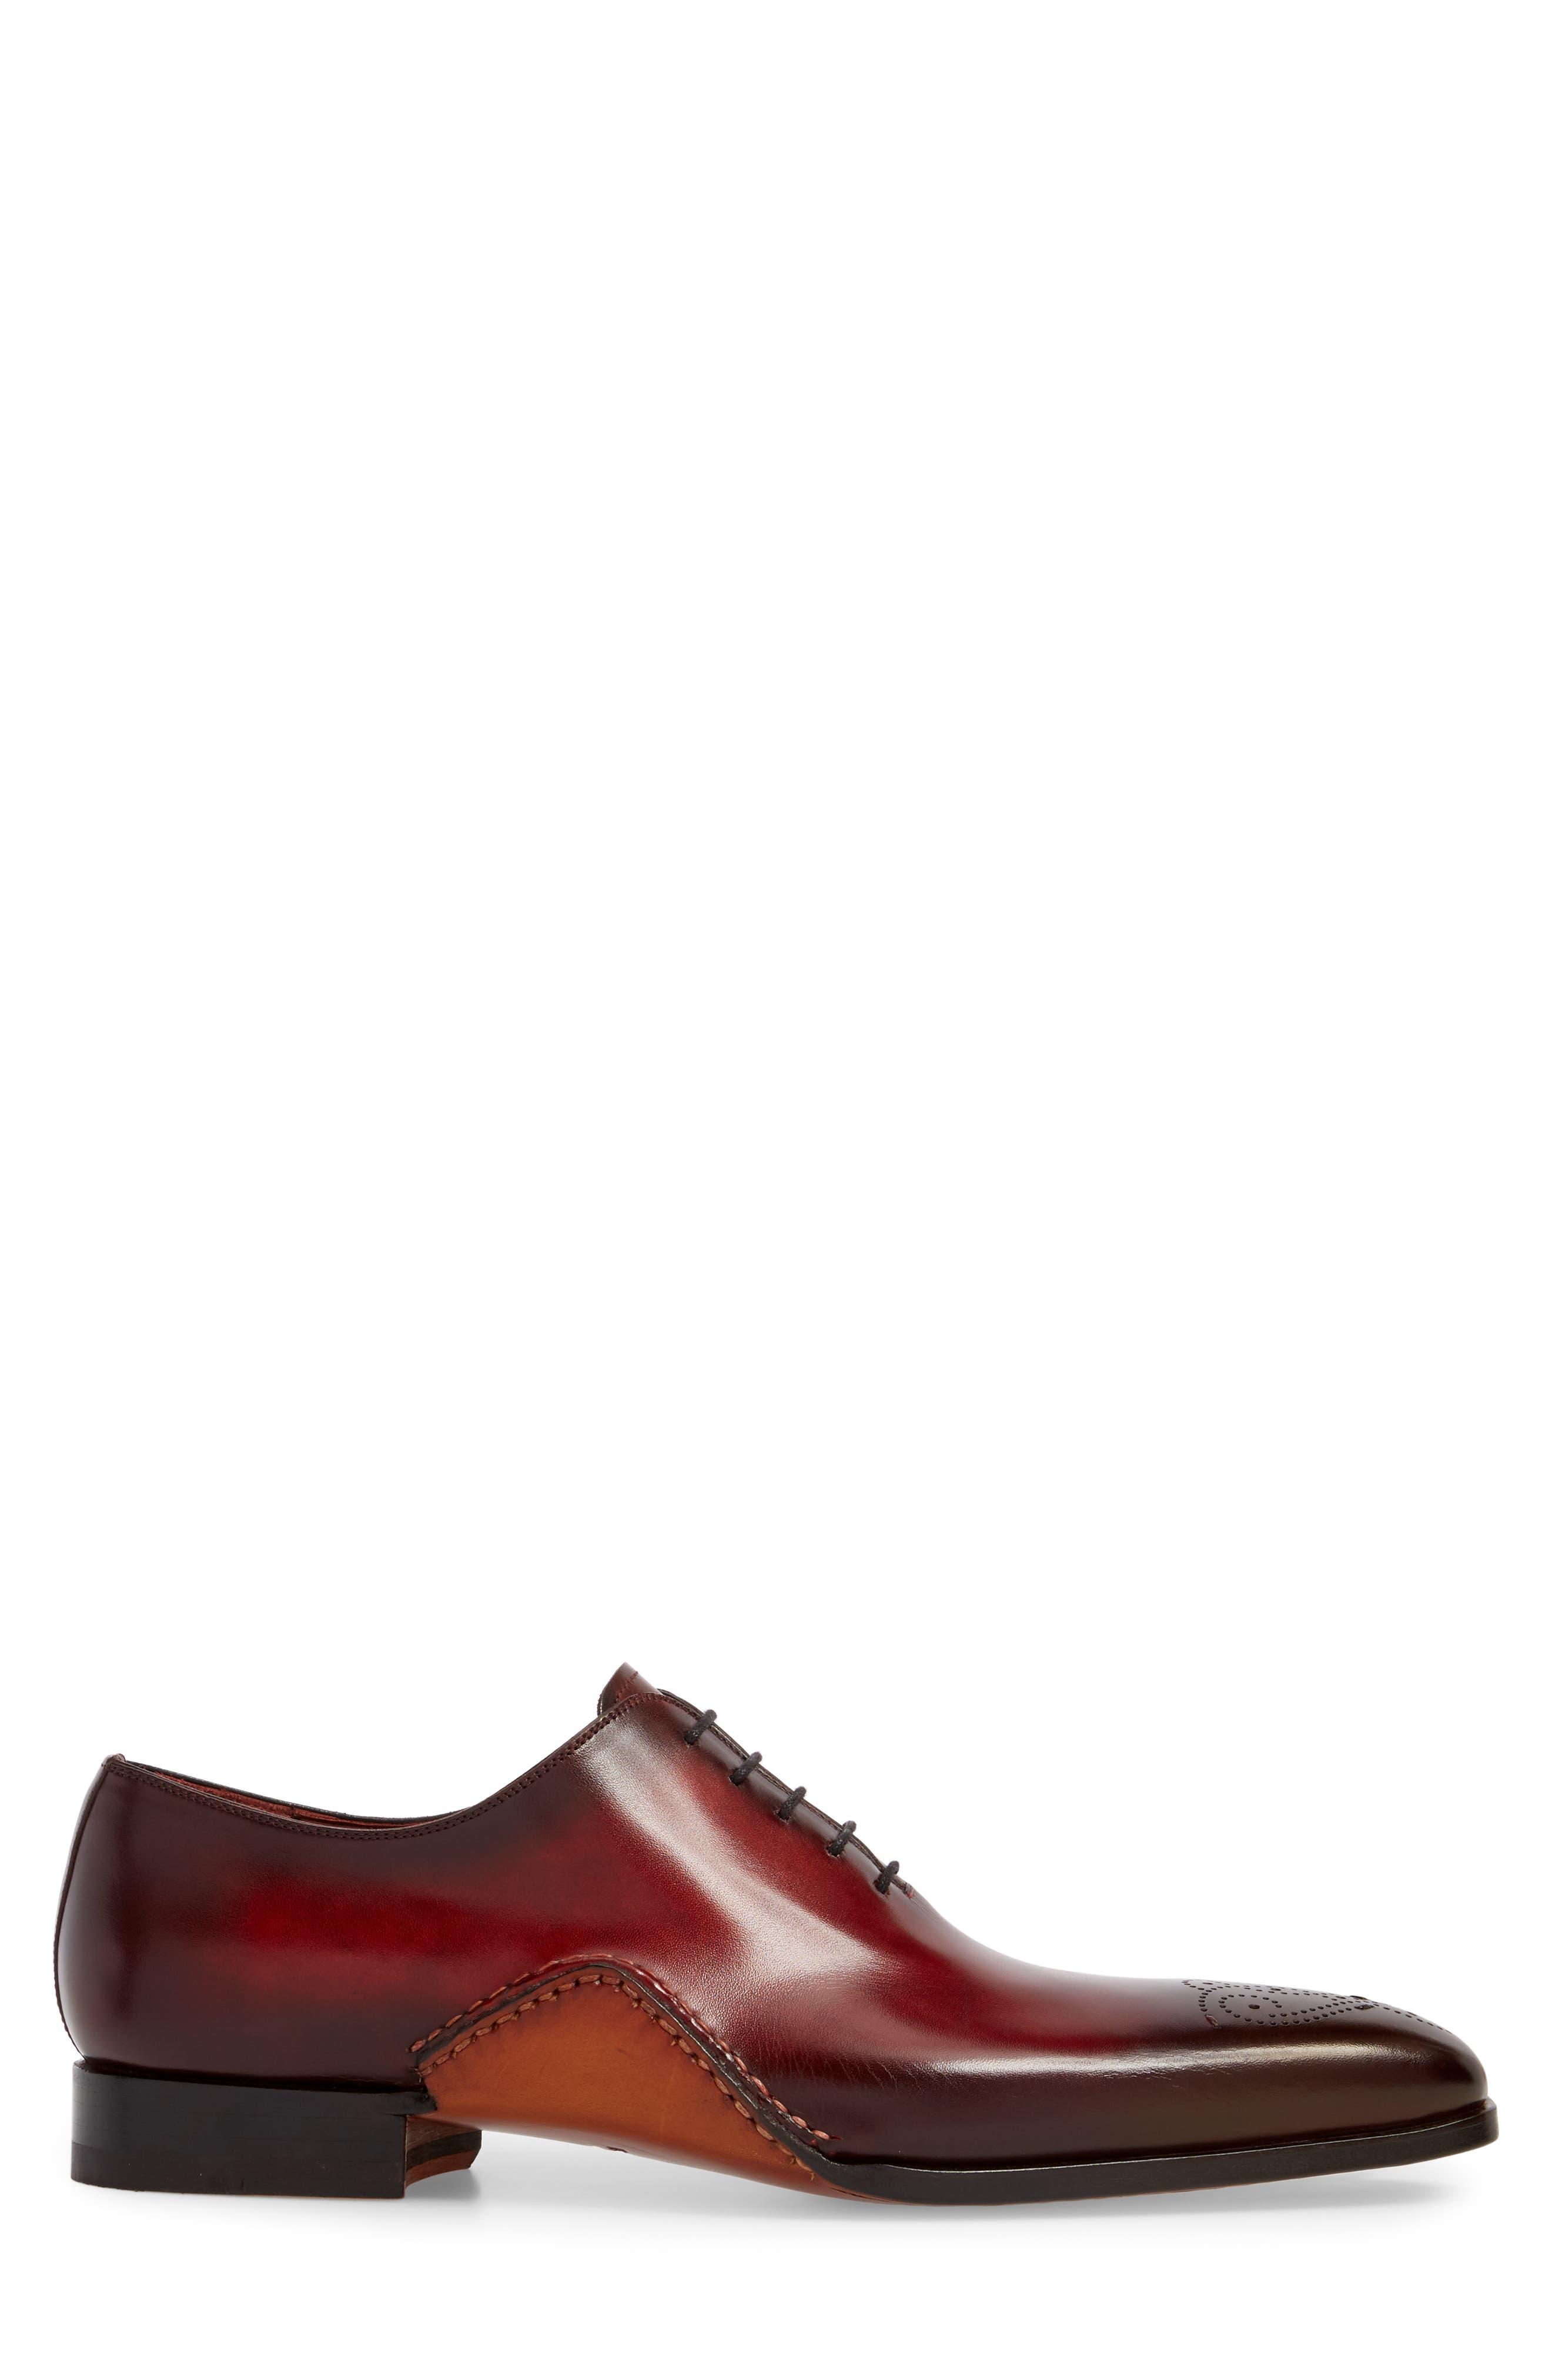 Vada Brogued Whole Cut Shoe,                             Alternate thumbnail 3, color,                             600